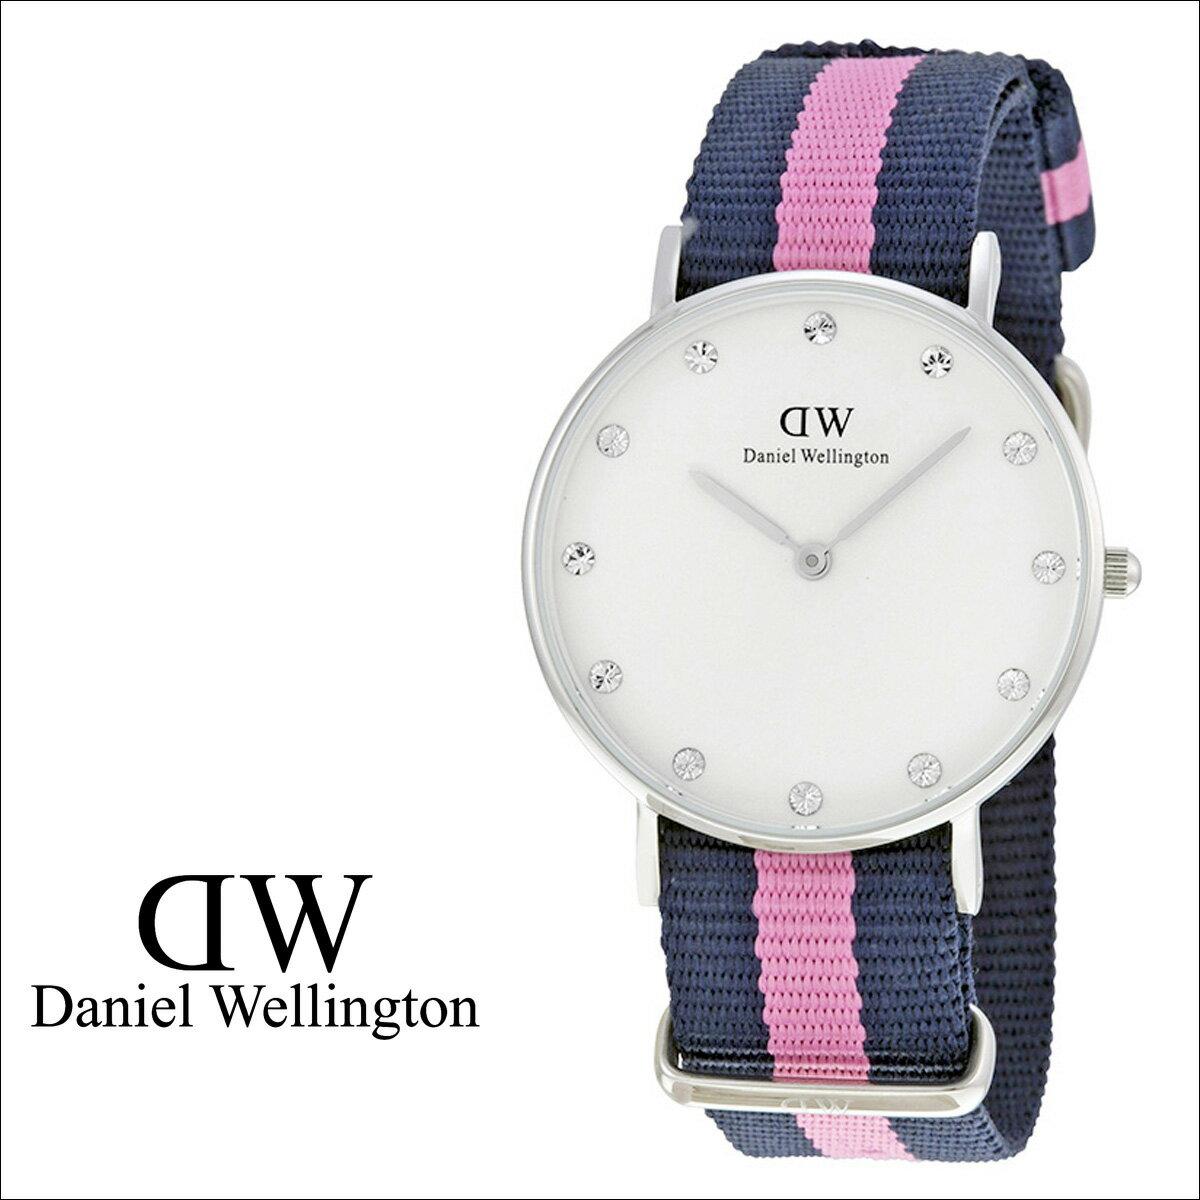 Daniel Wellington ダニエルウェリントン 34mm 腕時計 レディース  0962DW CLASSY WINCHESTER  シルバー